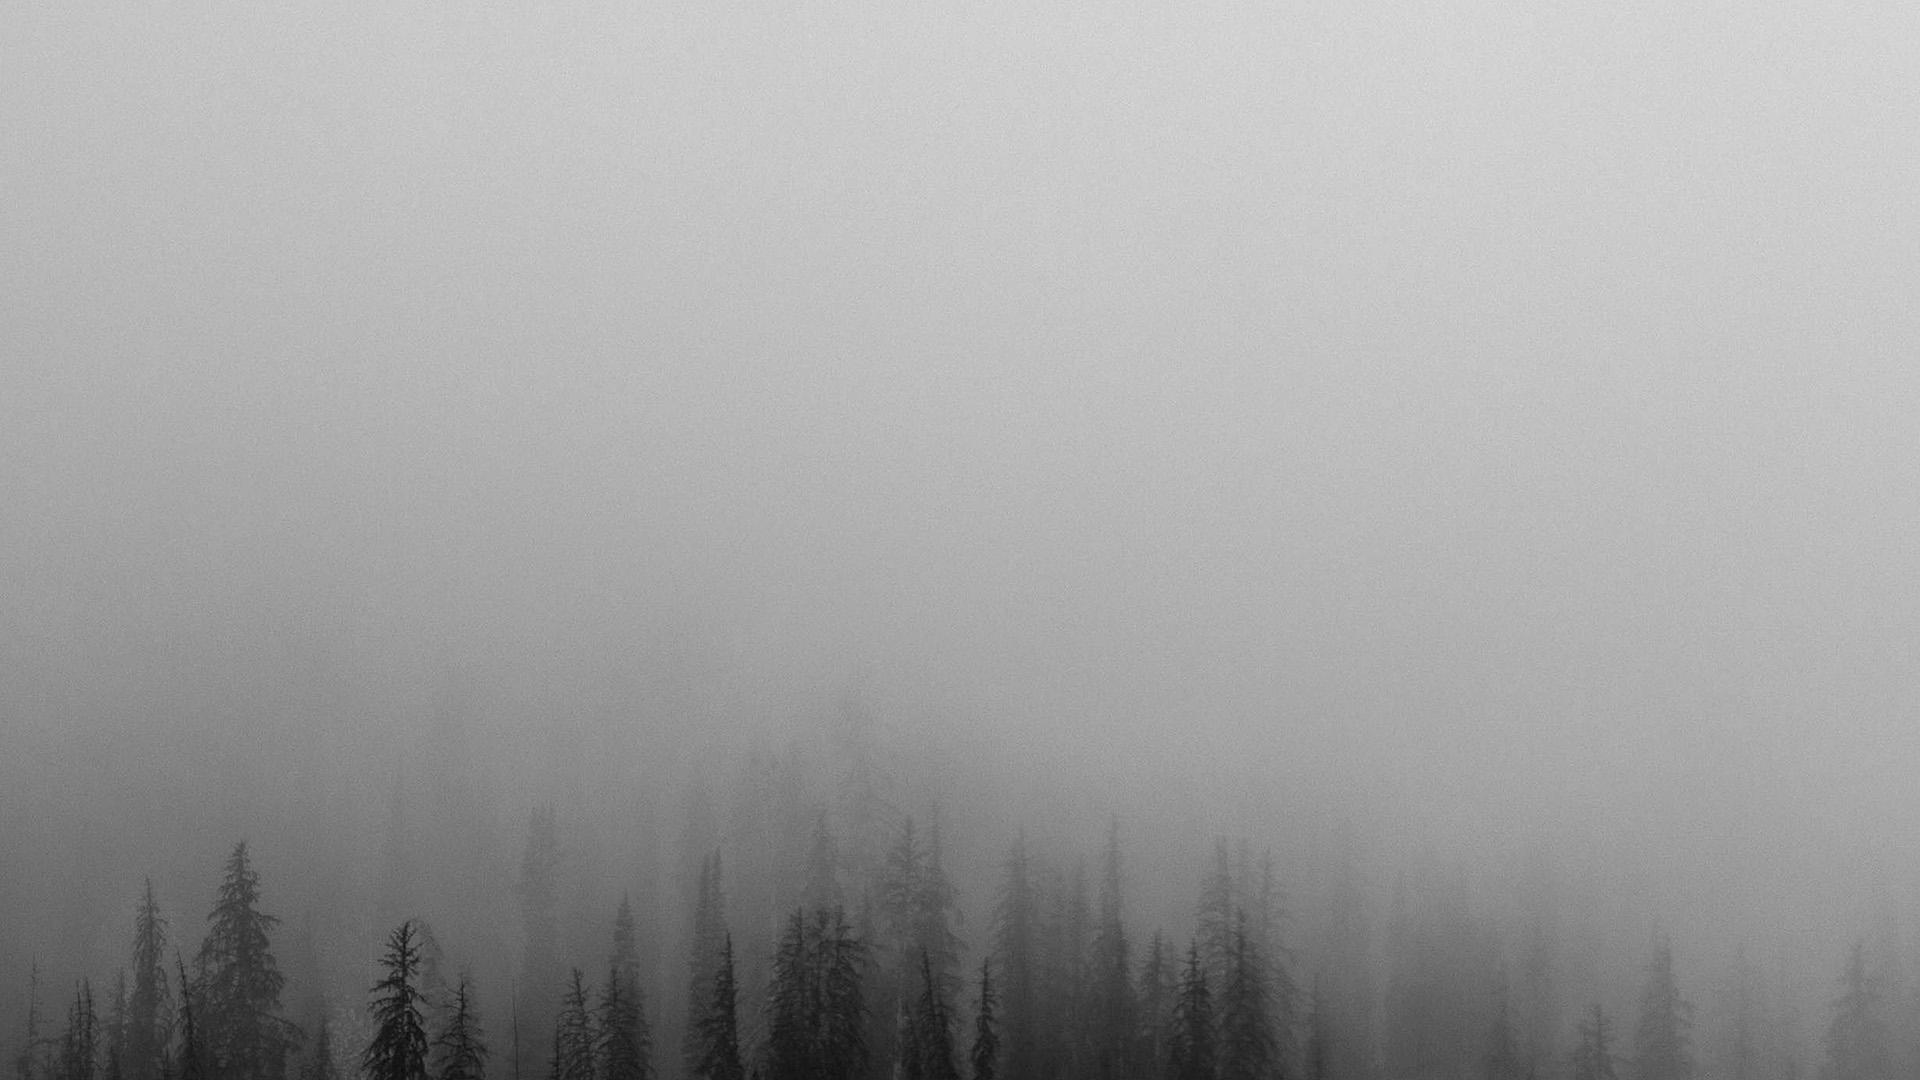 no61-fog-minimal-mountain-wood-nature-wallpaper